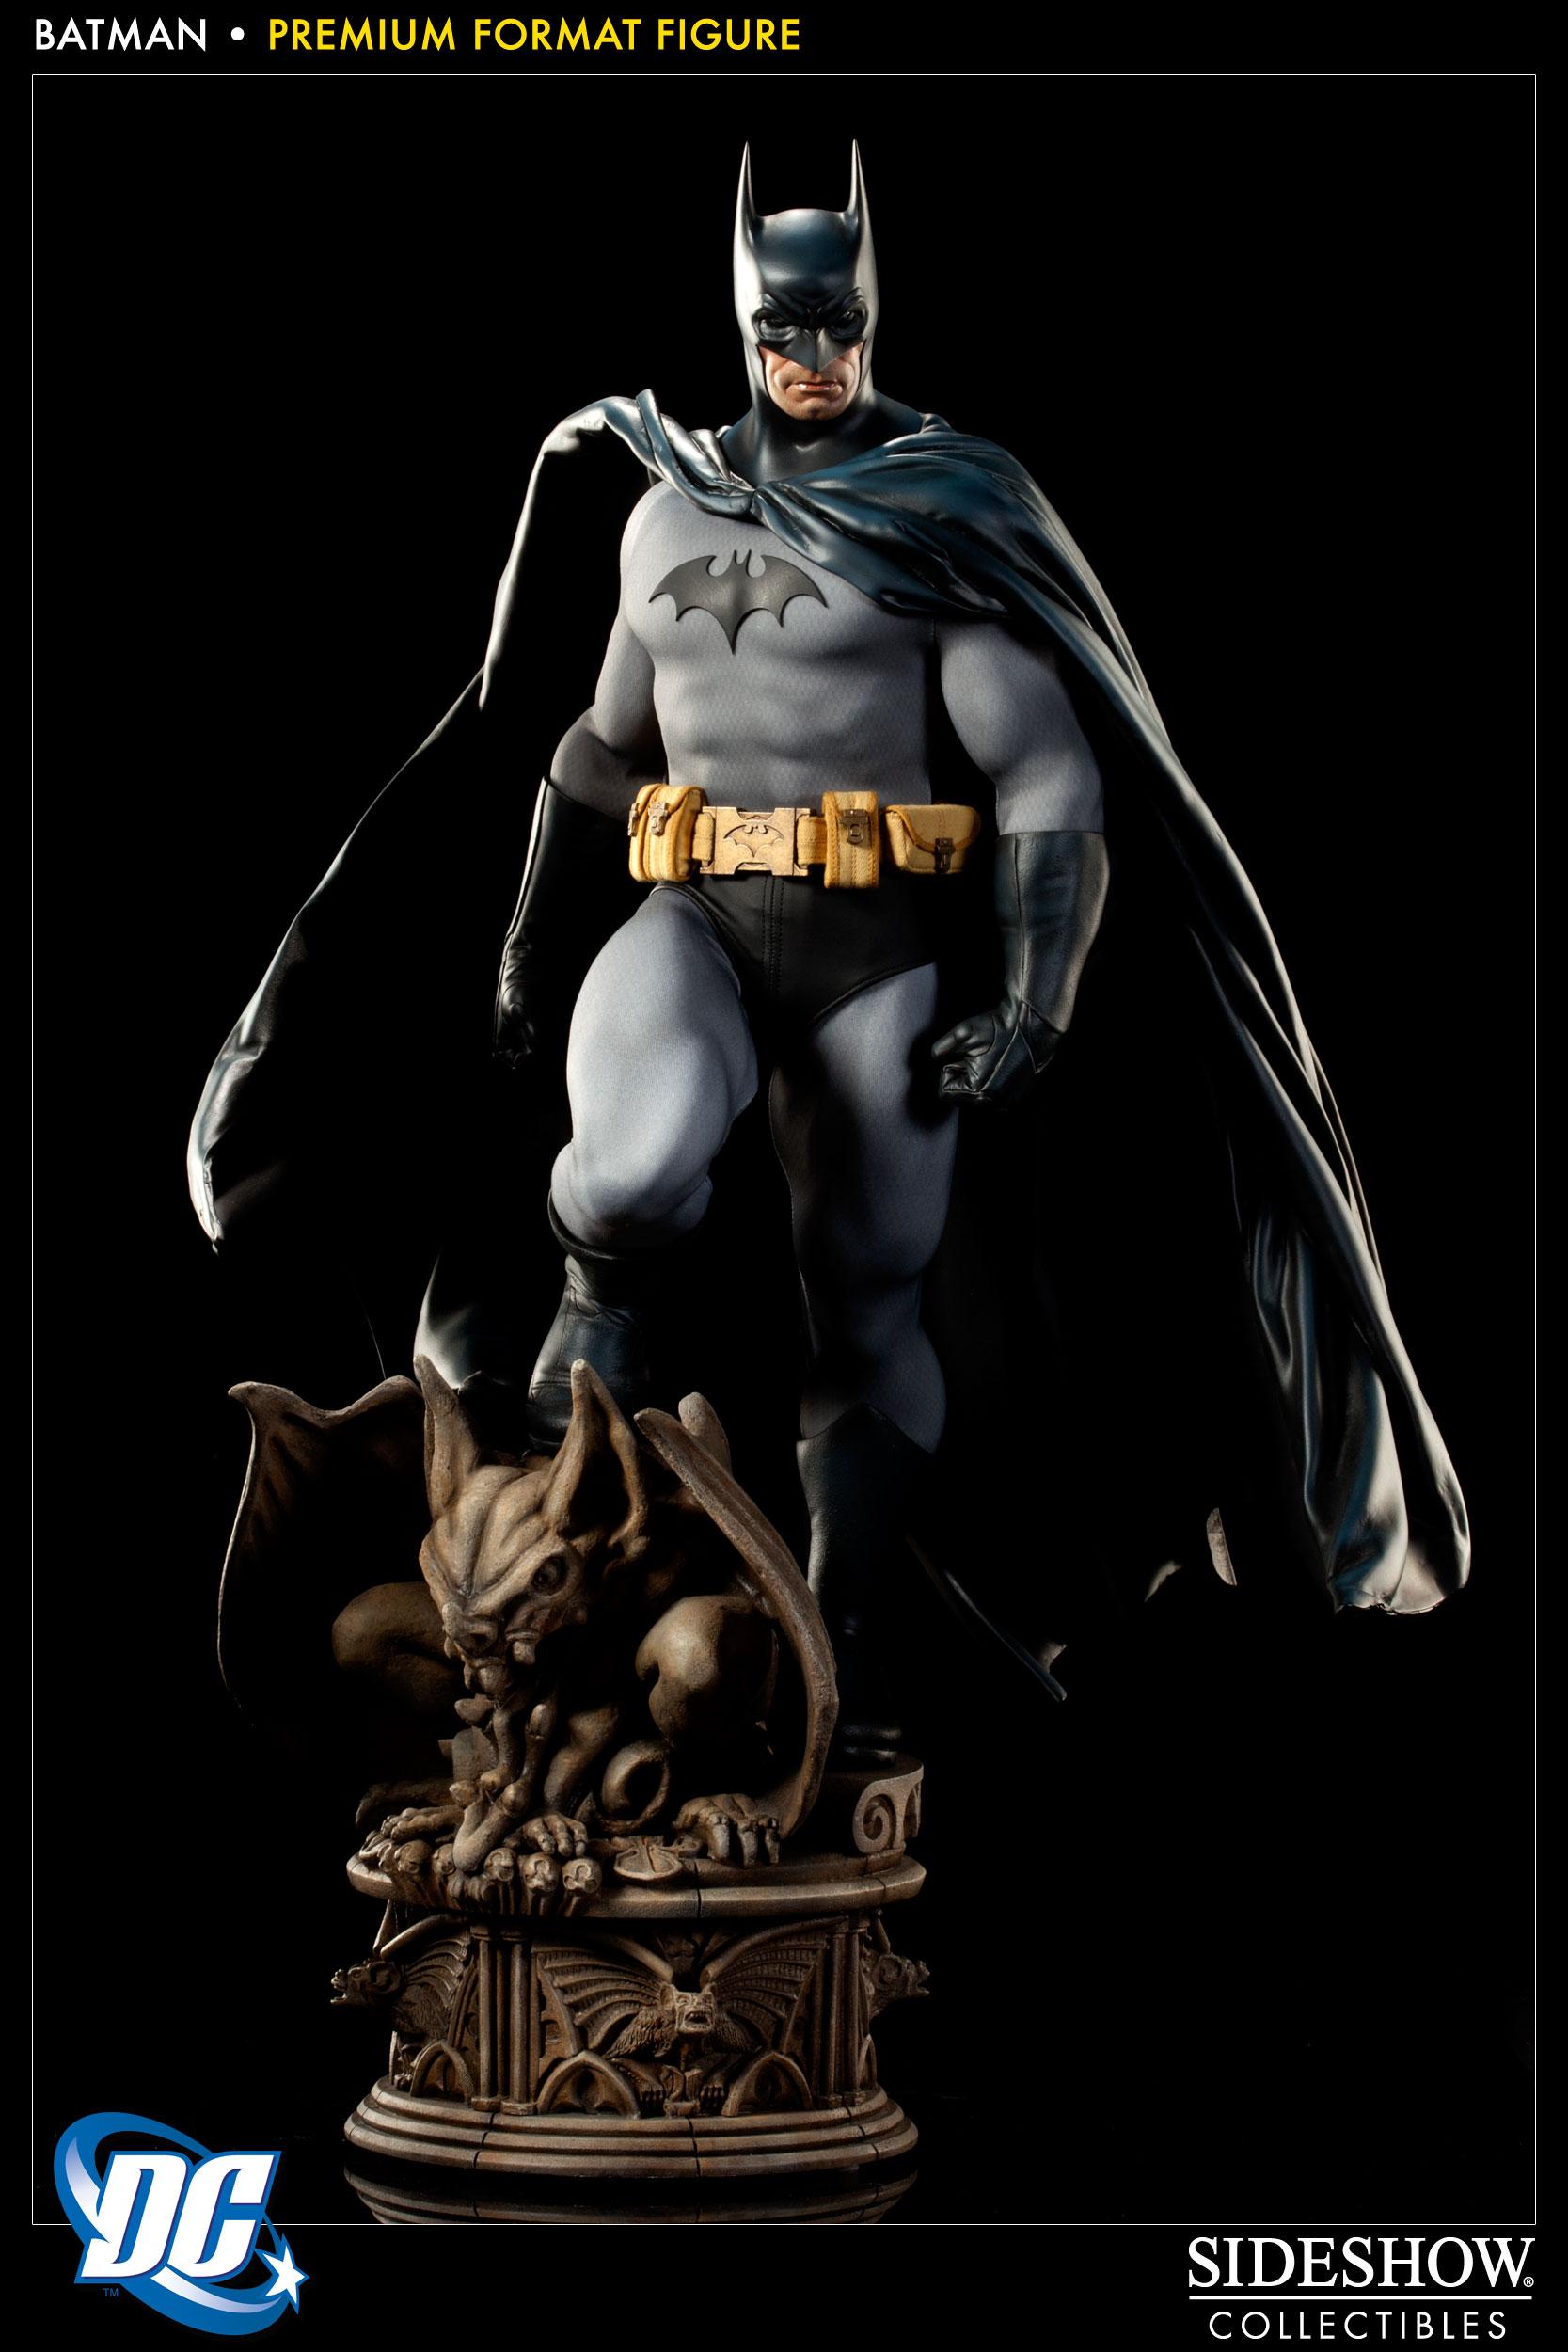 [Action Figures] Todo sobre Action Figures, Hot Toys, Sideshows Batman-premium-format-figure-wecollectgames